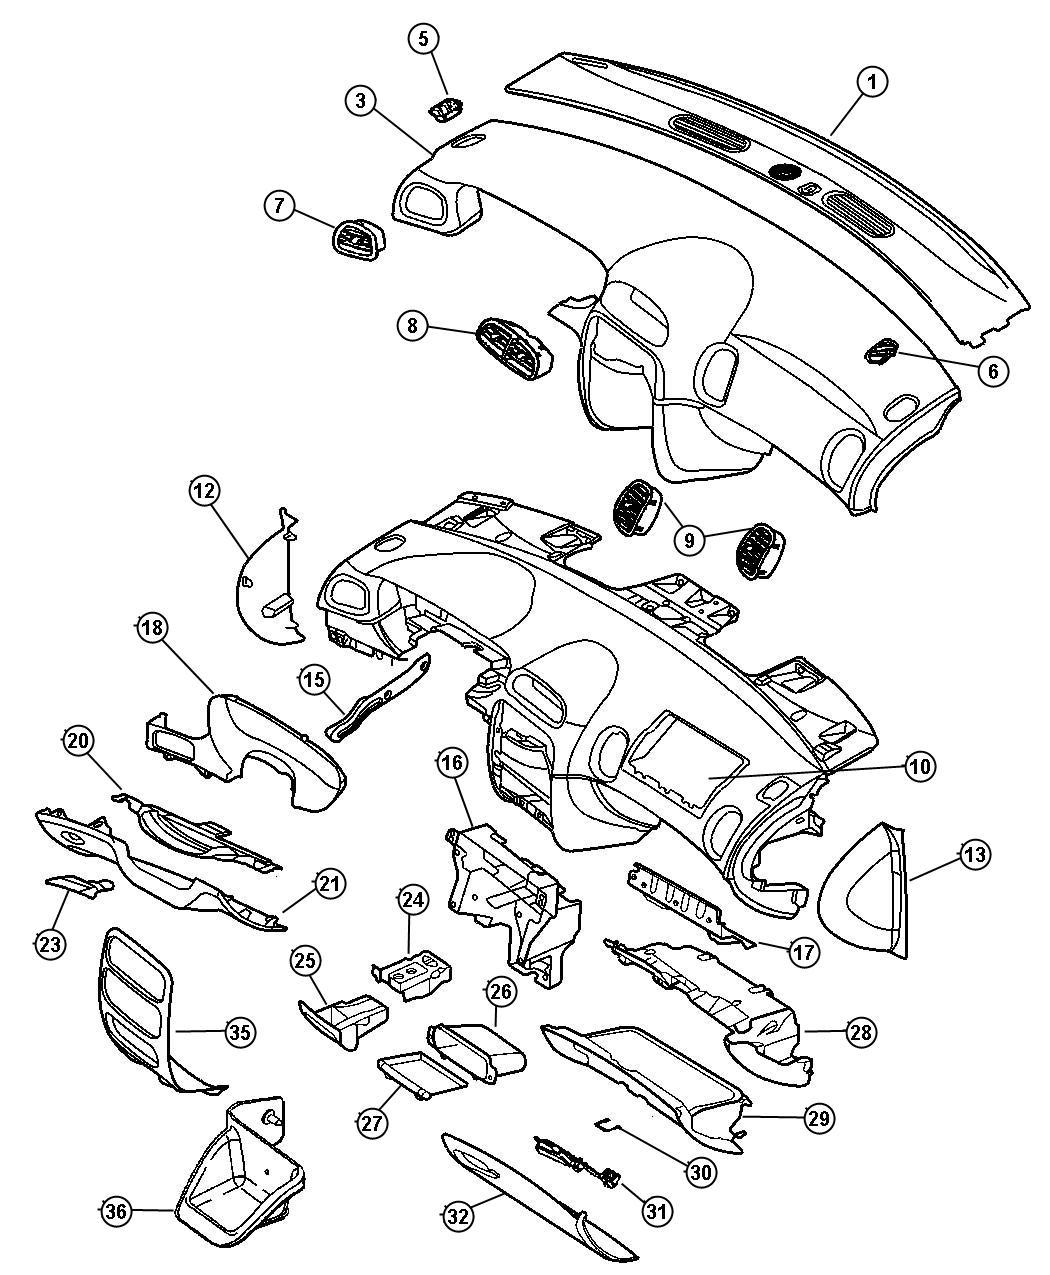 1999 Chrysler LHS Latch. Glovebox door. Med. Quartz, med